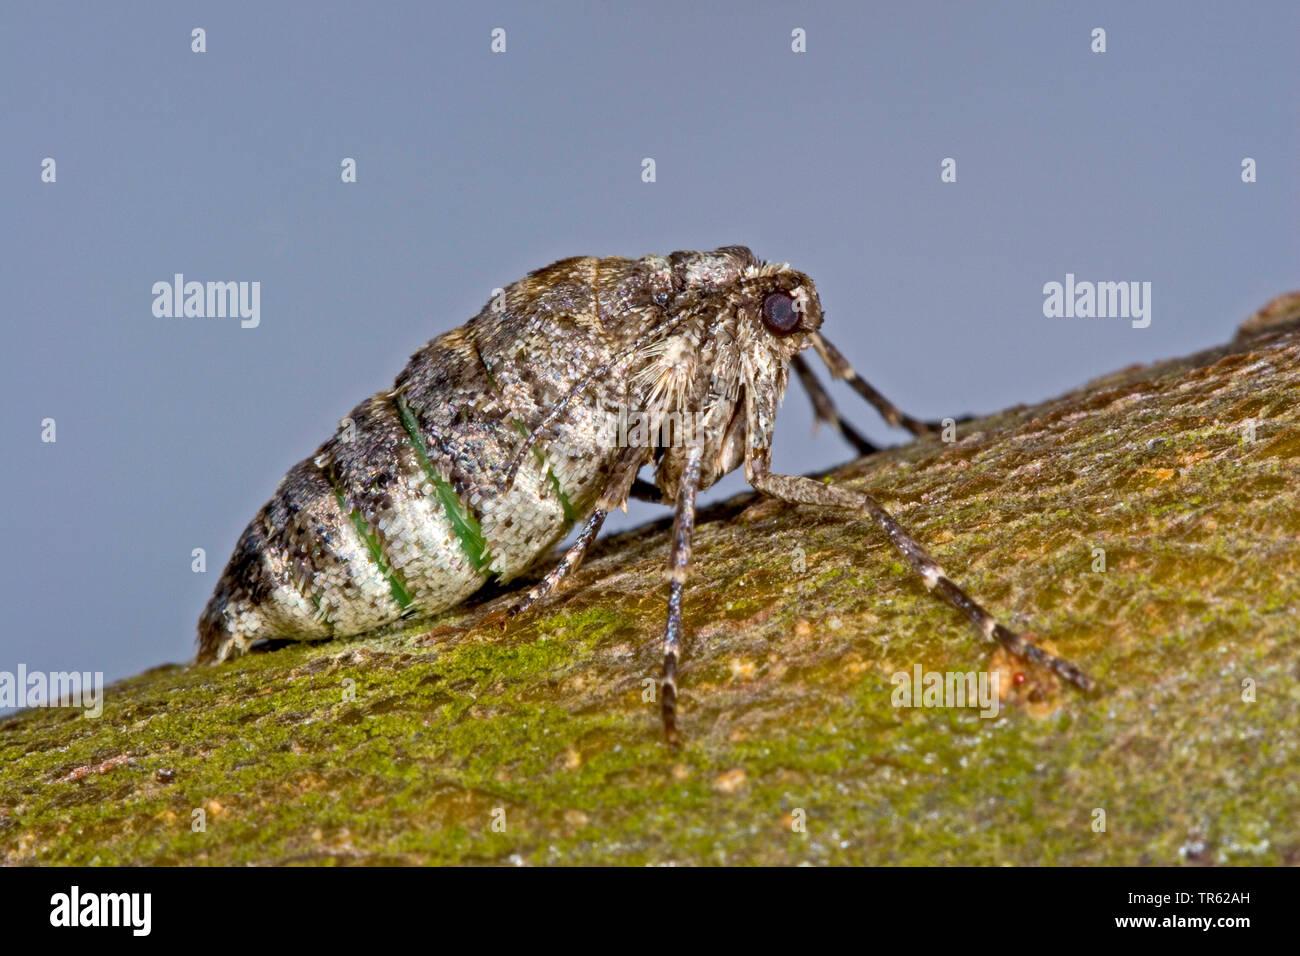 Pale brindled beauty (Apocheima pilosaria, Phigalia pilosaria), wingless female, side view, Germany - Stock Image